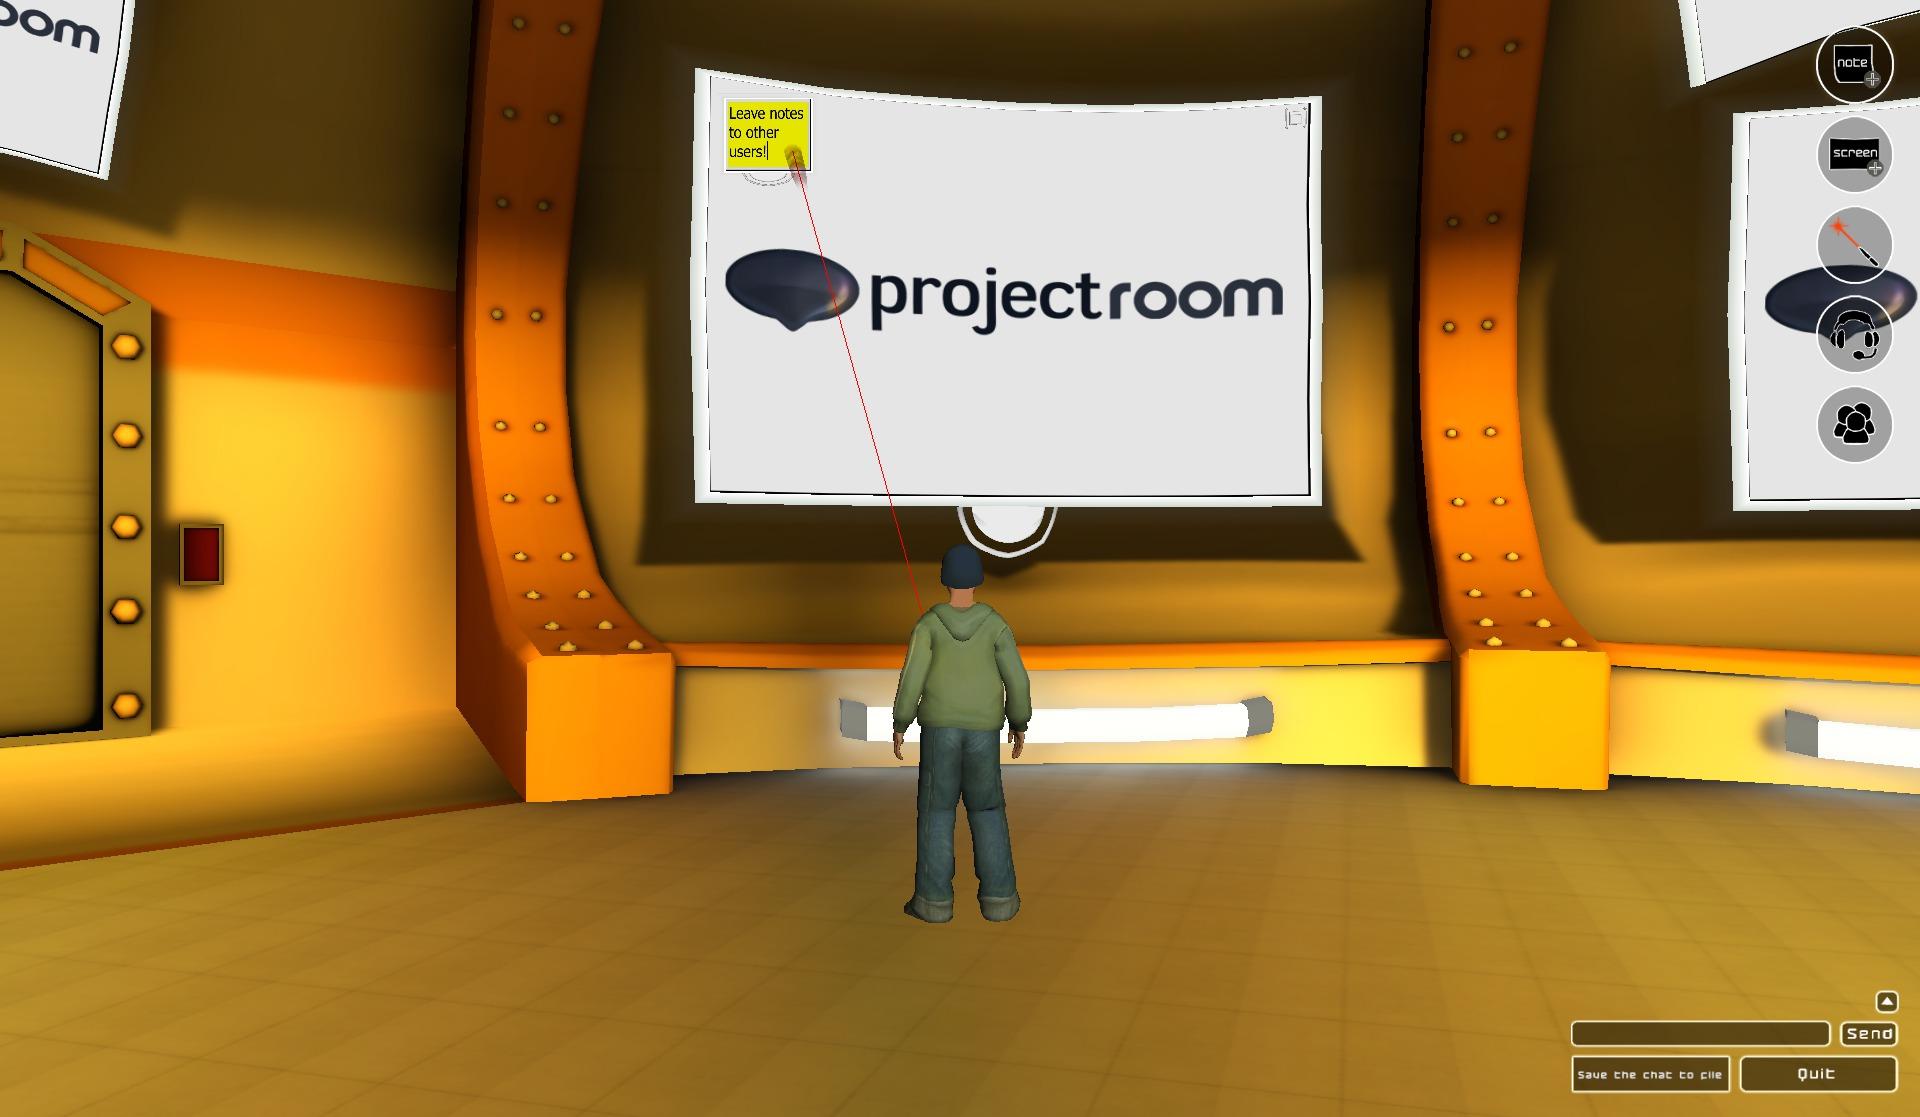 project_room_screenshot_01